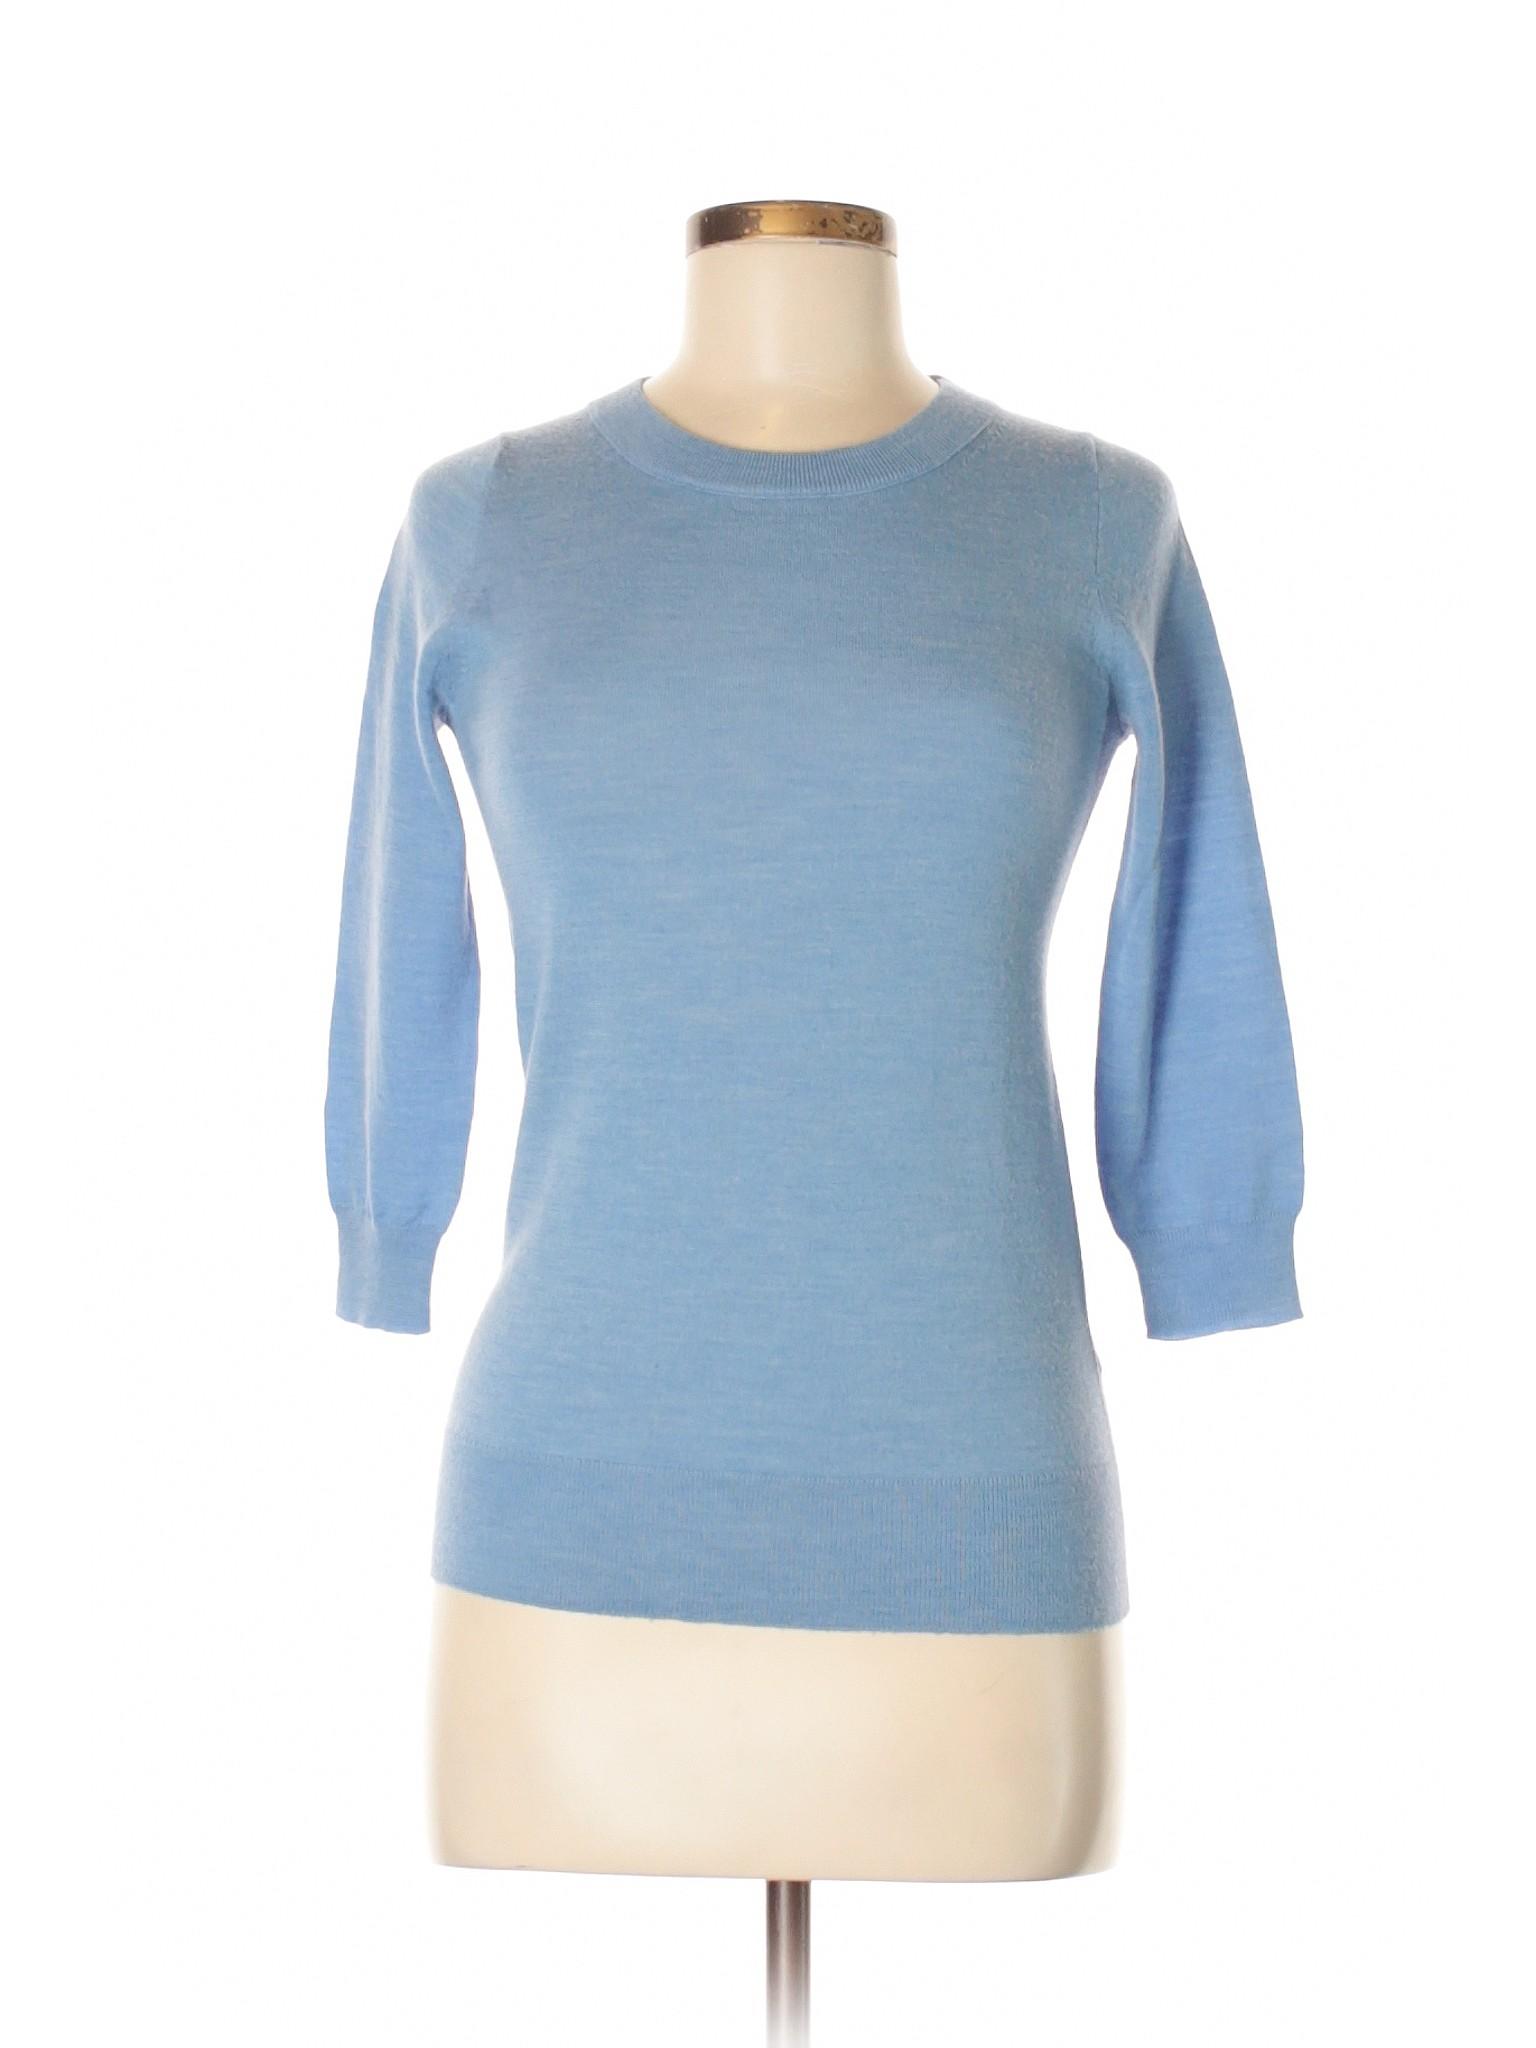 J Sweater Crew Pullover Wool Boutique 6wazASdq6x